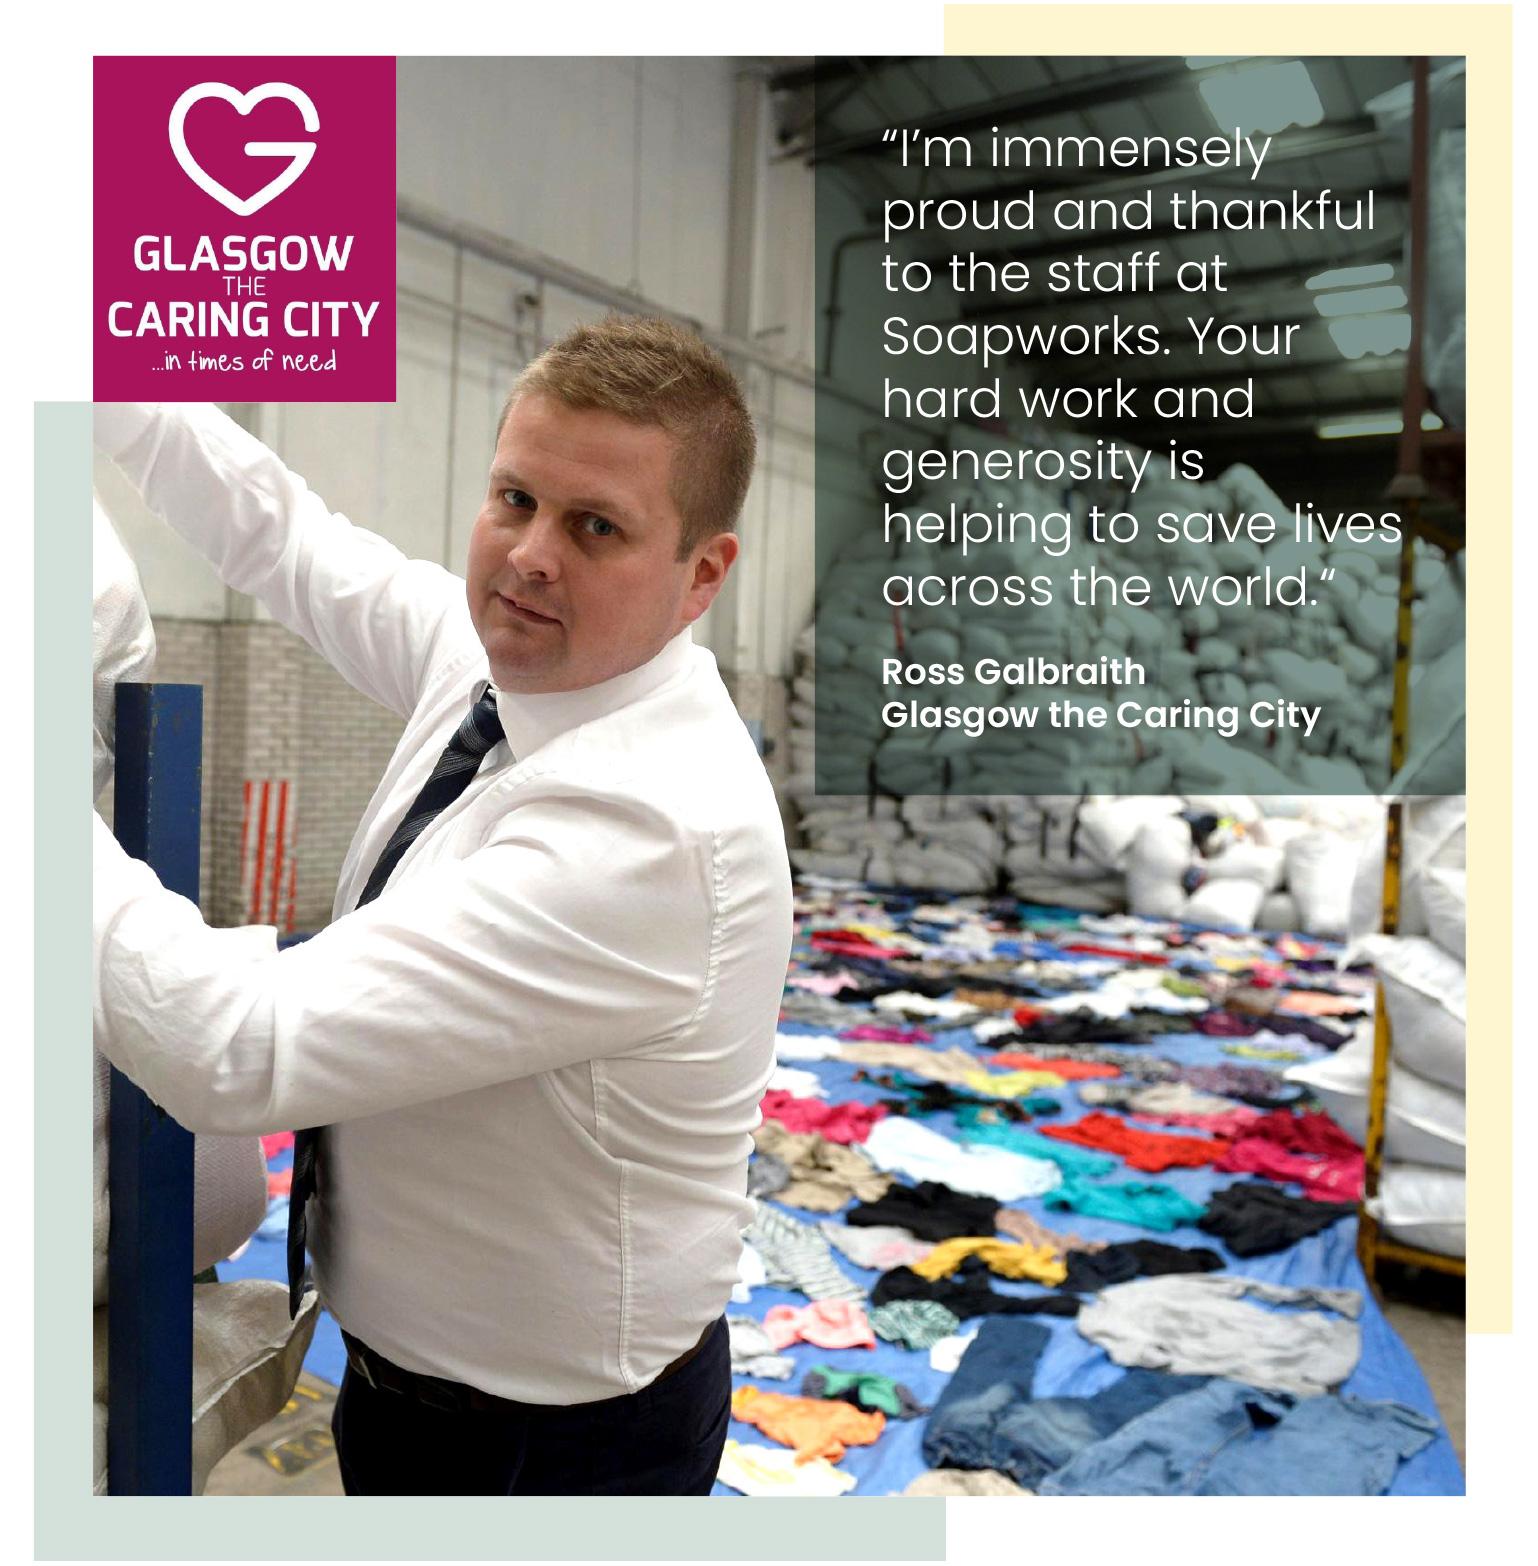 Glasgow the Caring City founder Ross Galbraith